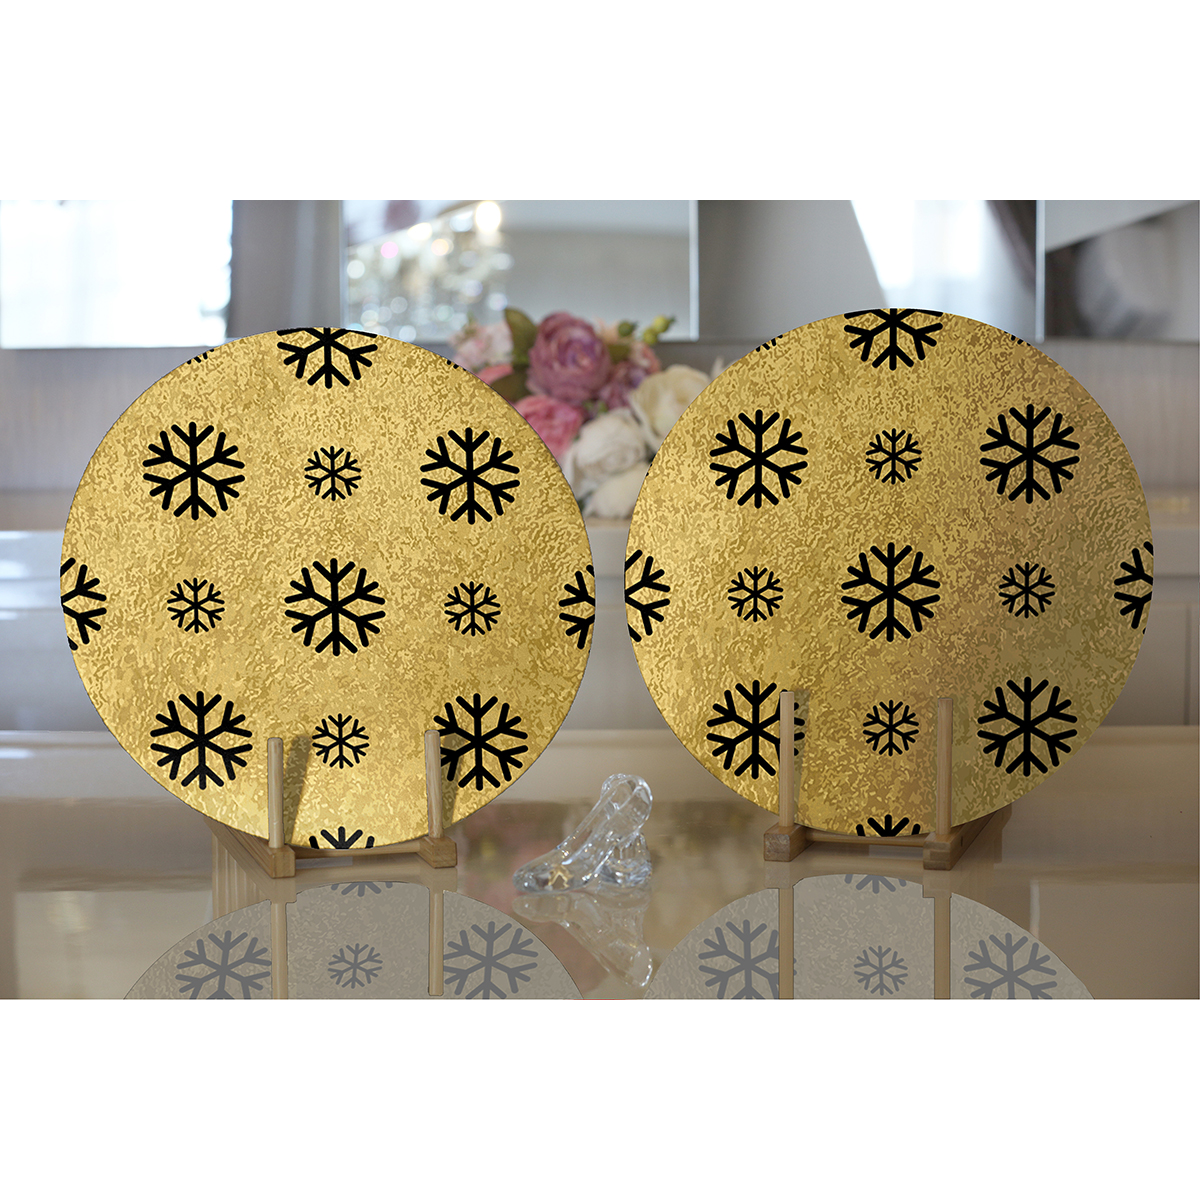 Realhomes Gold Zemin Üzerinde Siyah Renkli Kartanesi Desenli Modern 2'li Yuvarlak Servis Altlığı - Supla Realhomes